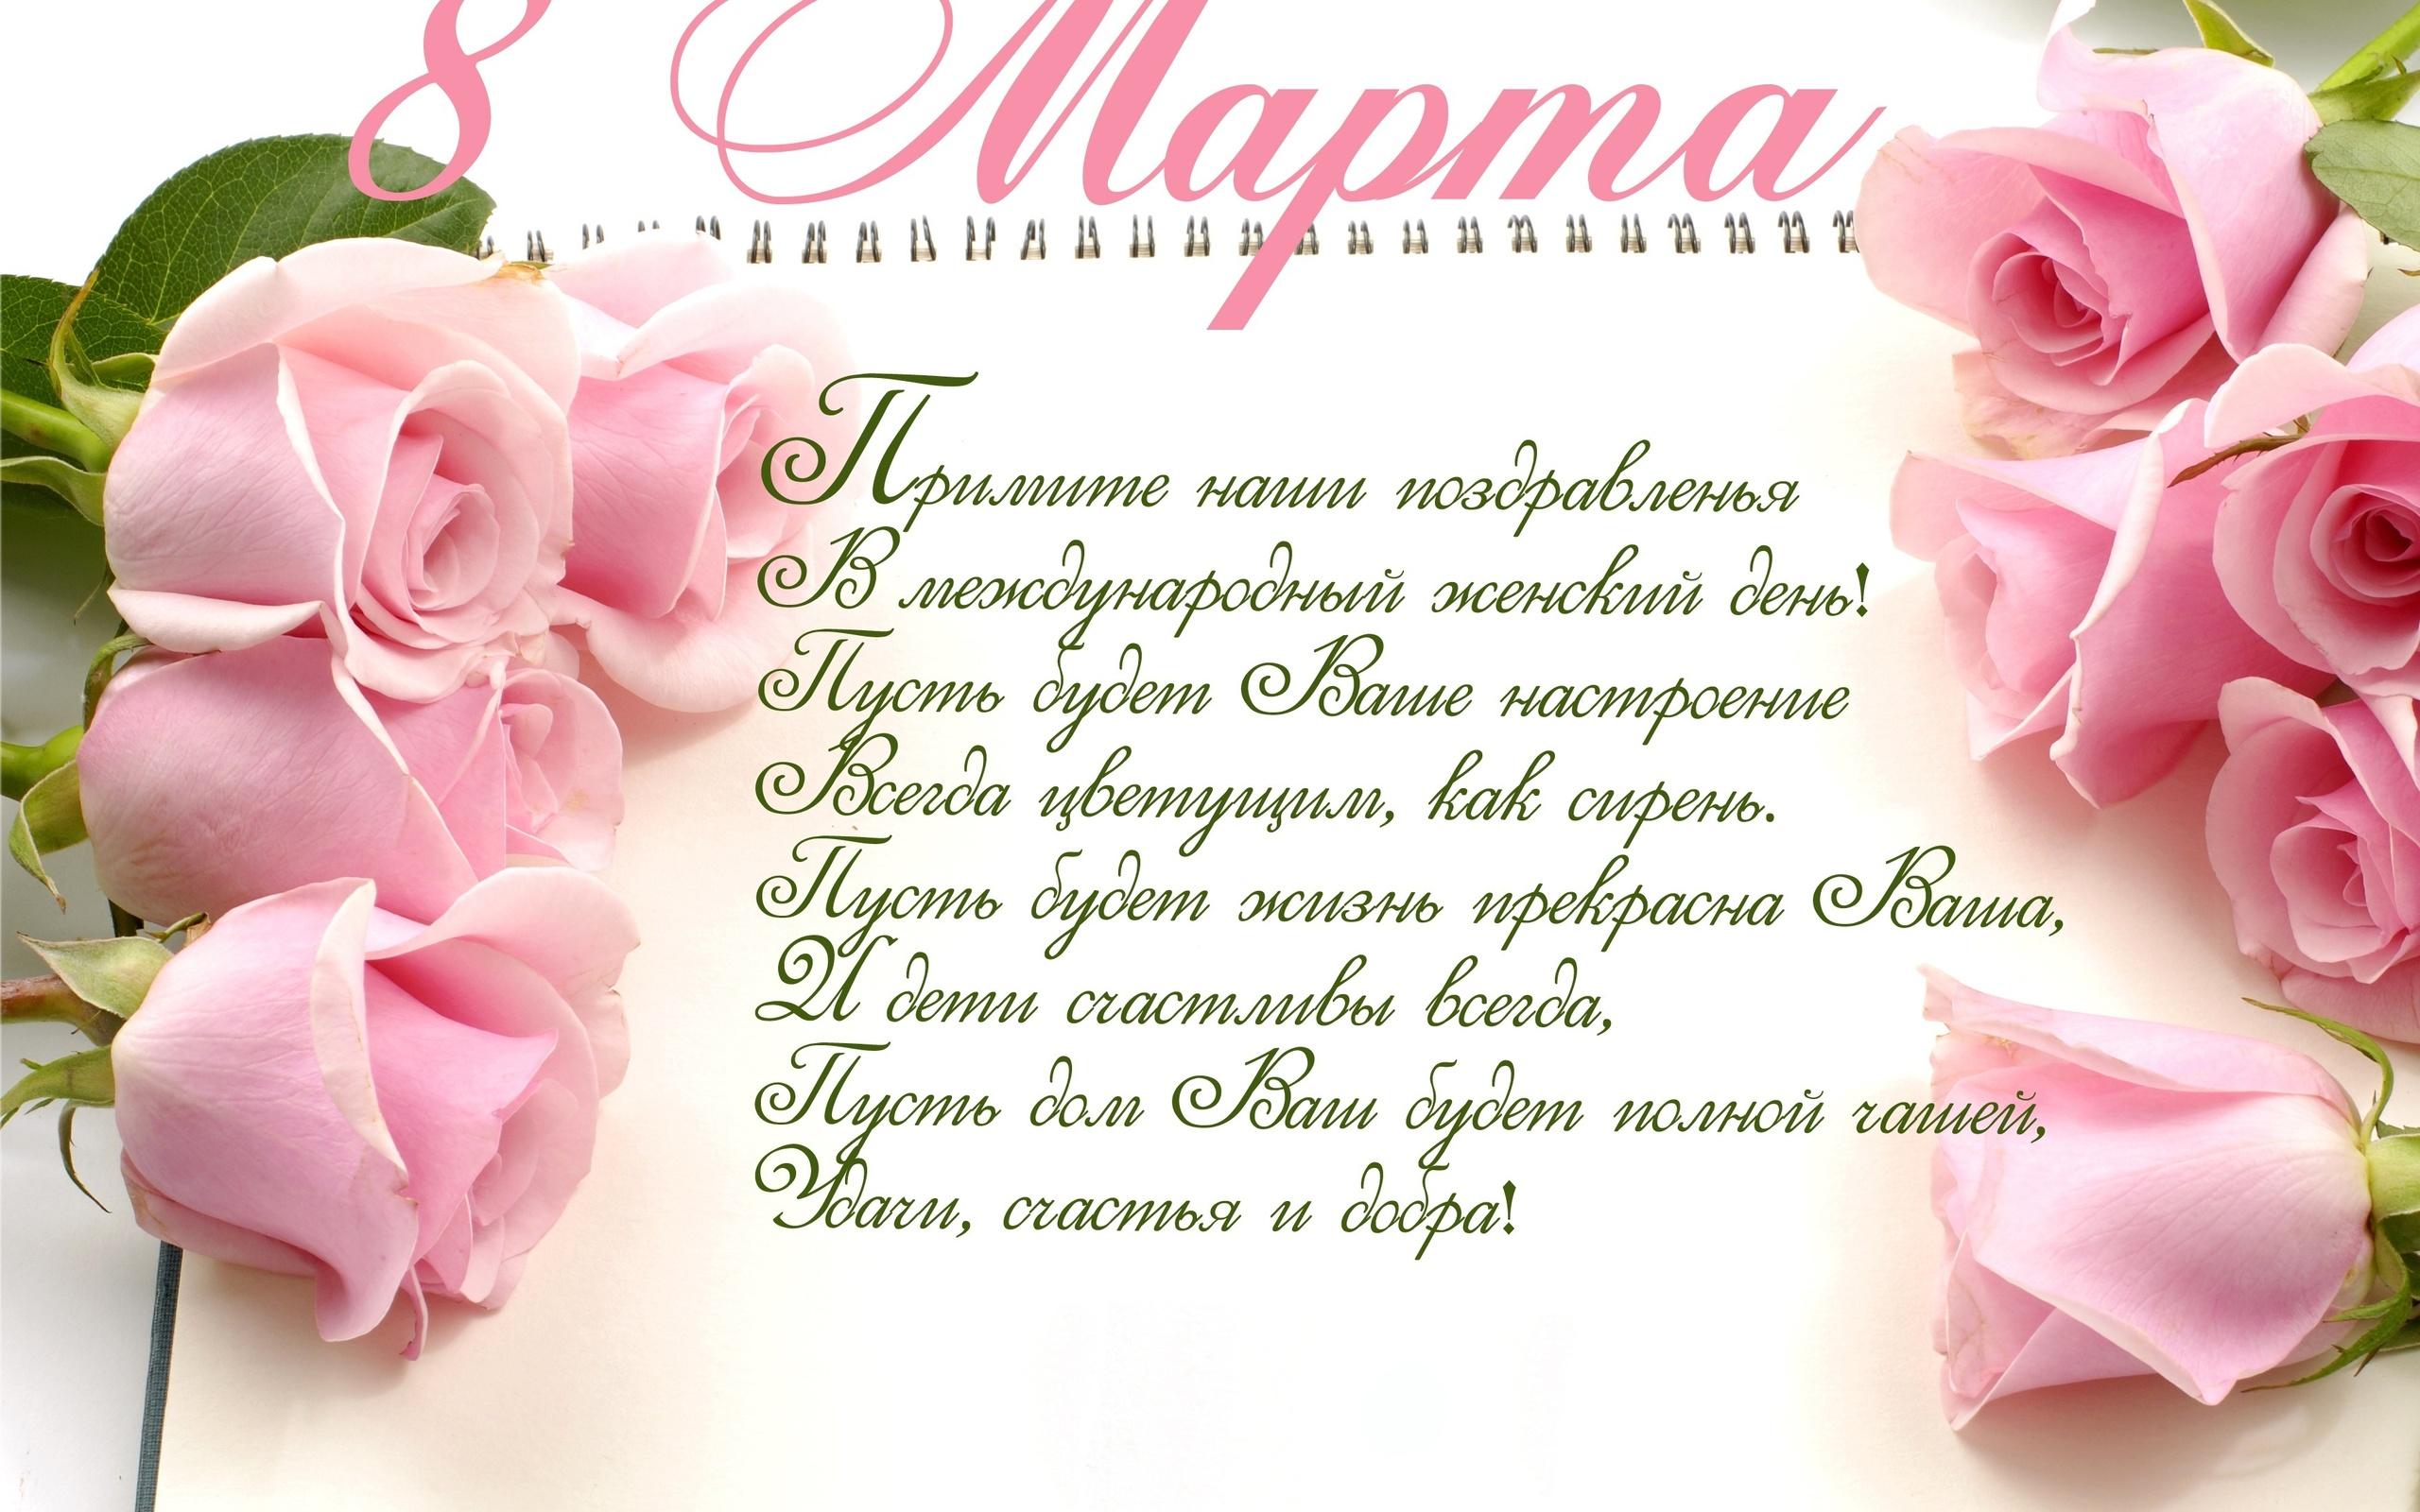 Поздравление и картинка на 8 марта, лапочка картинки открытки